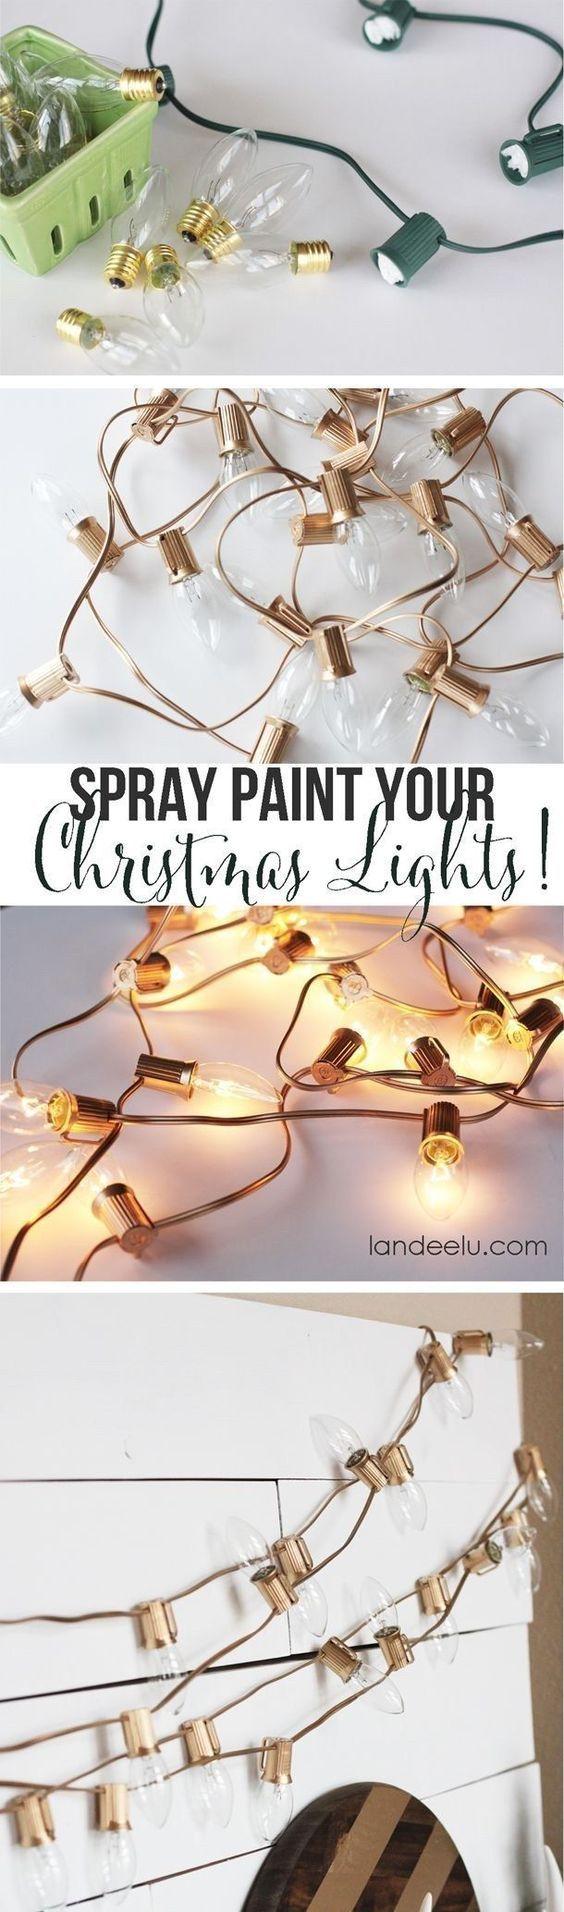 Diy Crafts String Light Diy Ideas For Cool Home Decor Spray